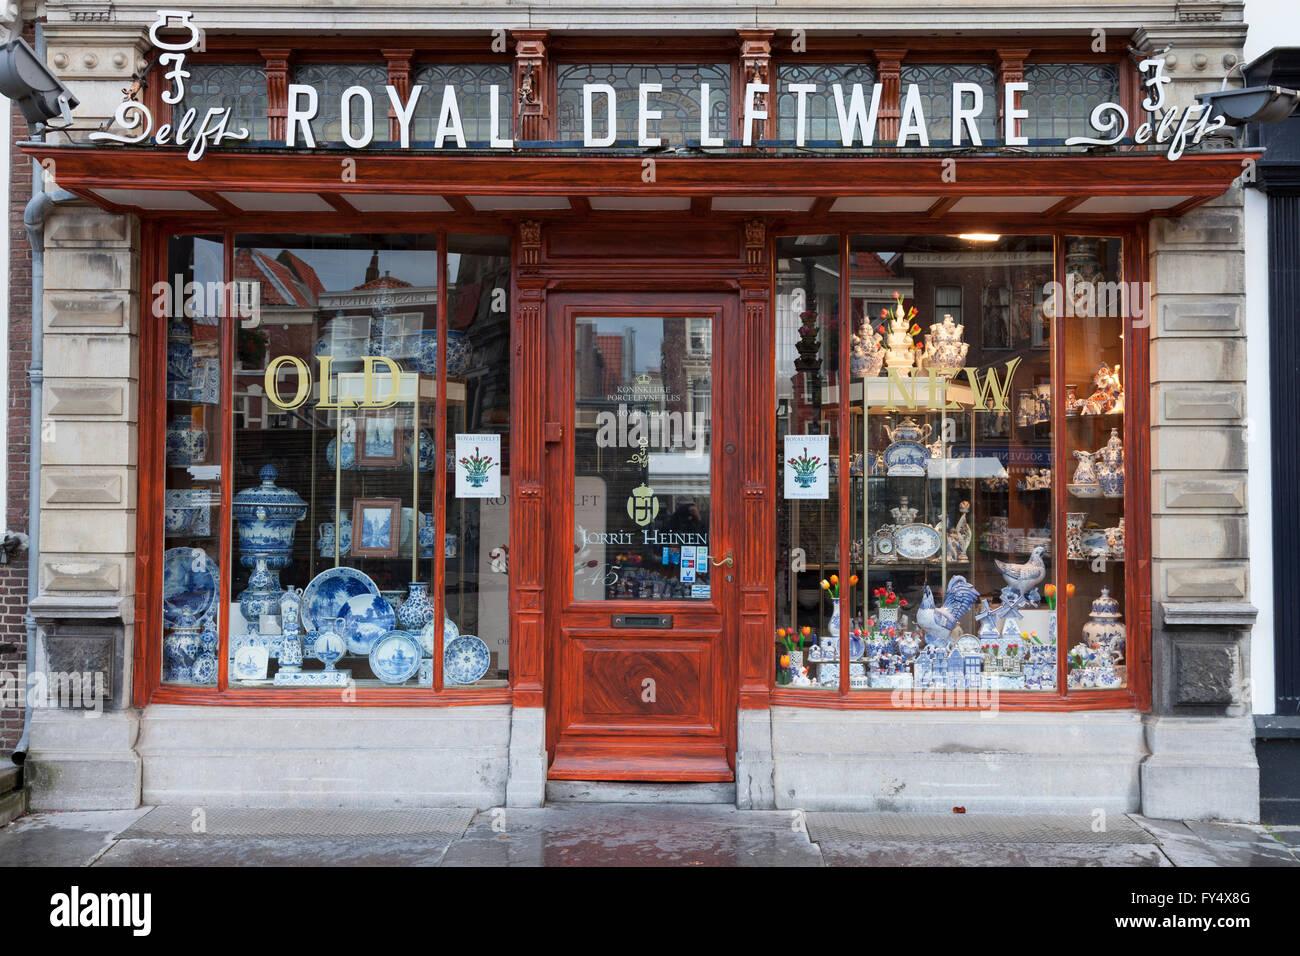 Shop selling Delft porcelain, Delftware or Delft pottery, Delft, Holland, The Netherlands - Stock Image